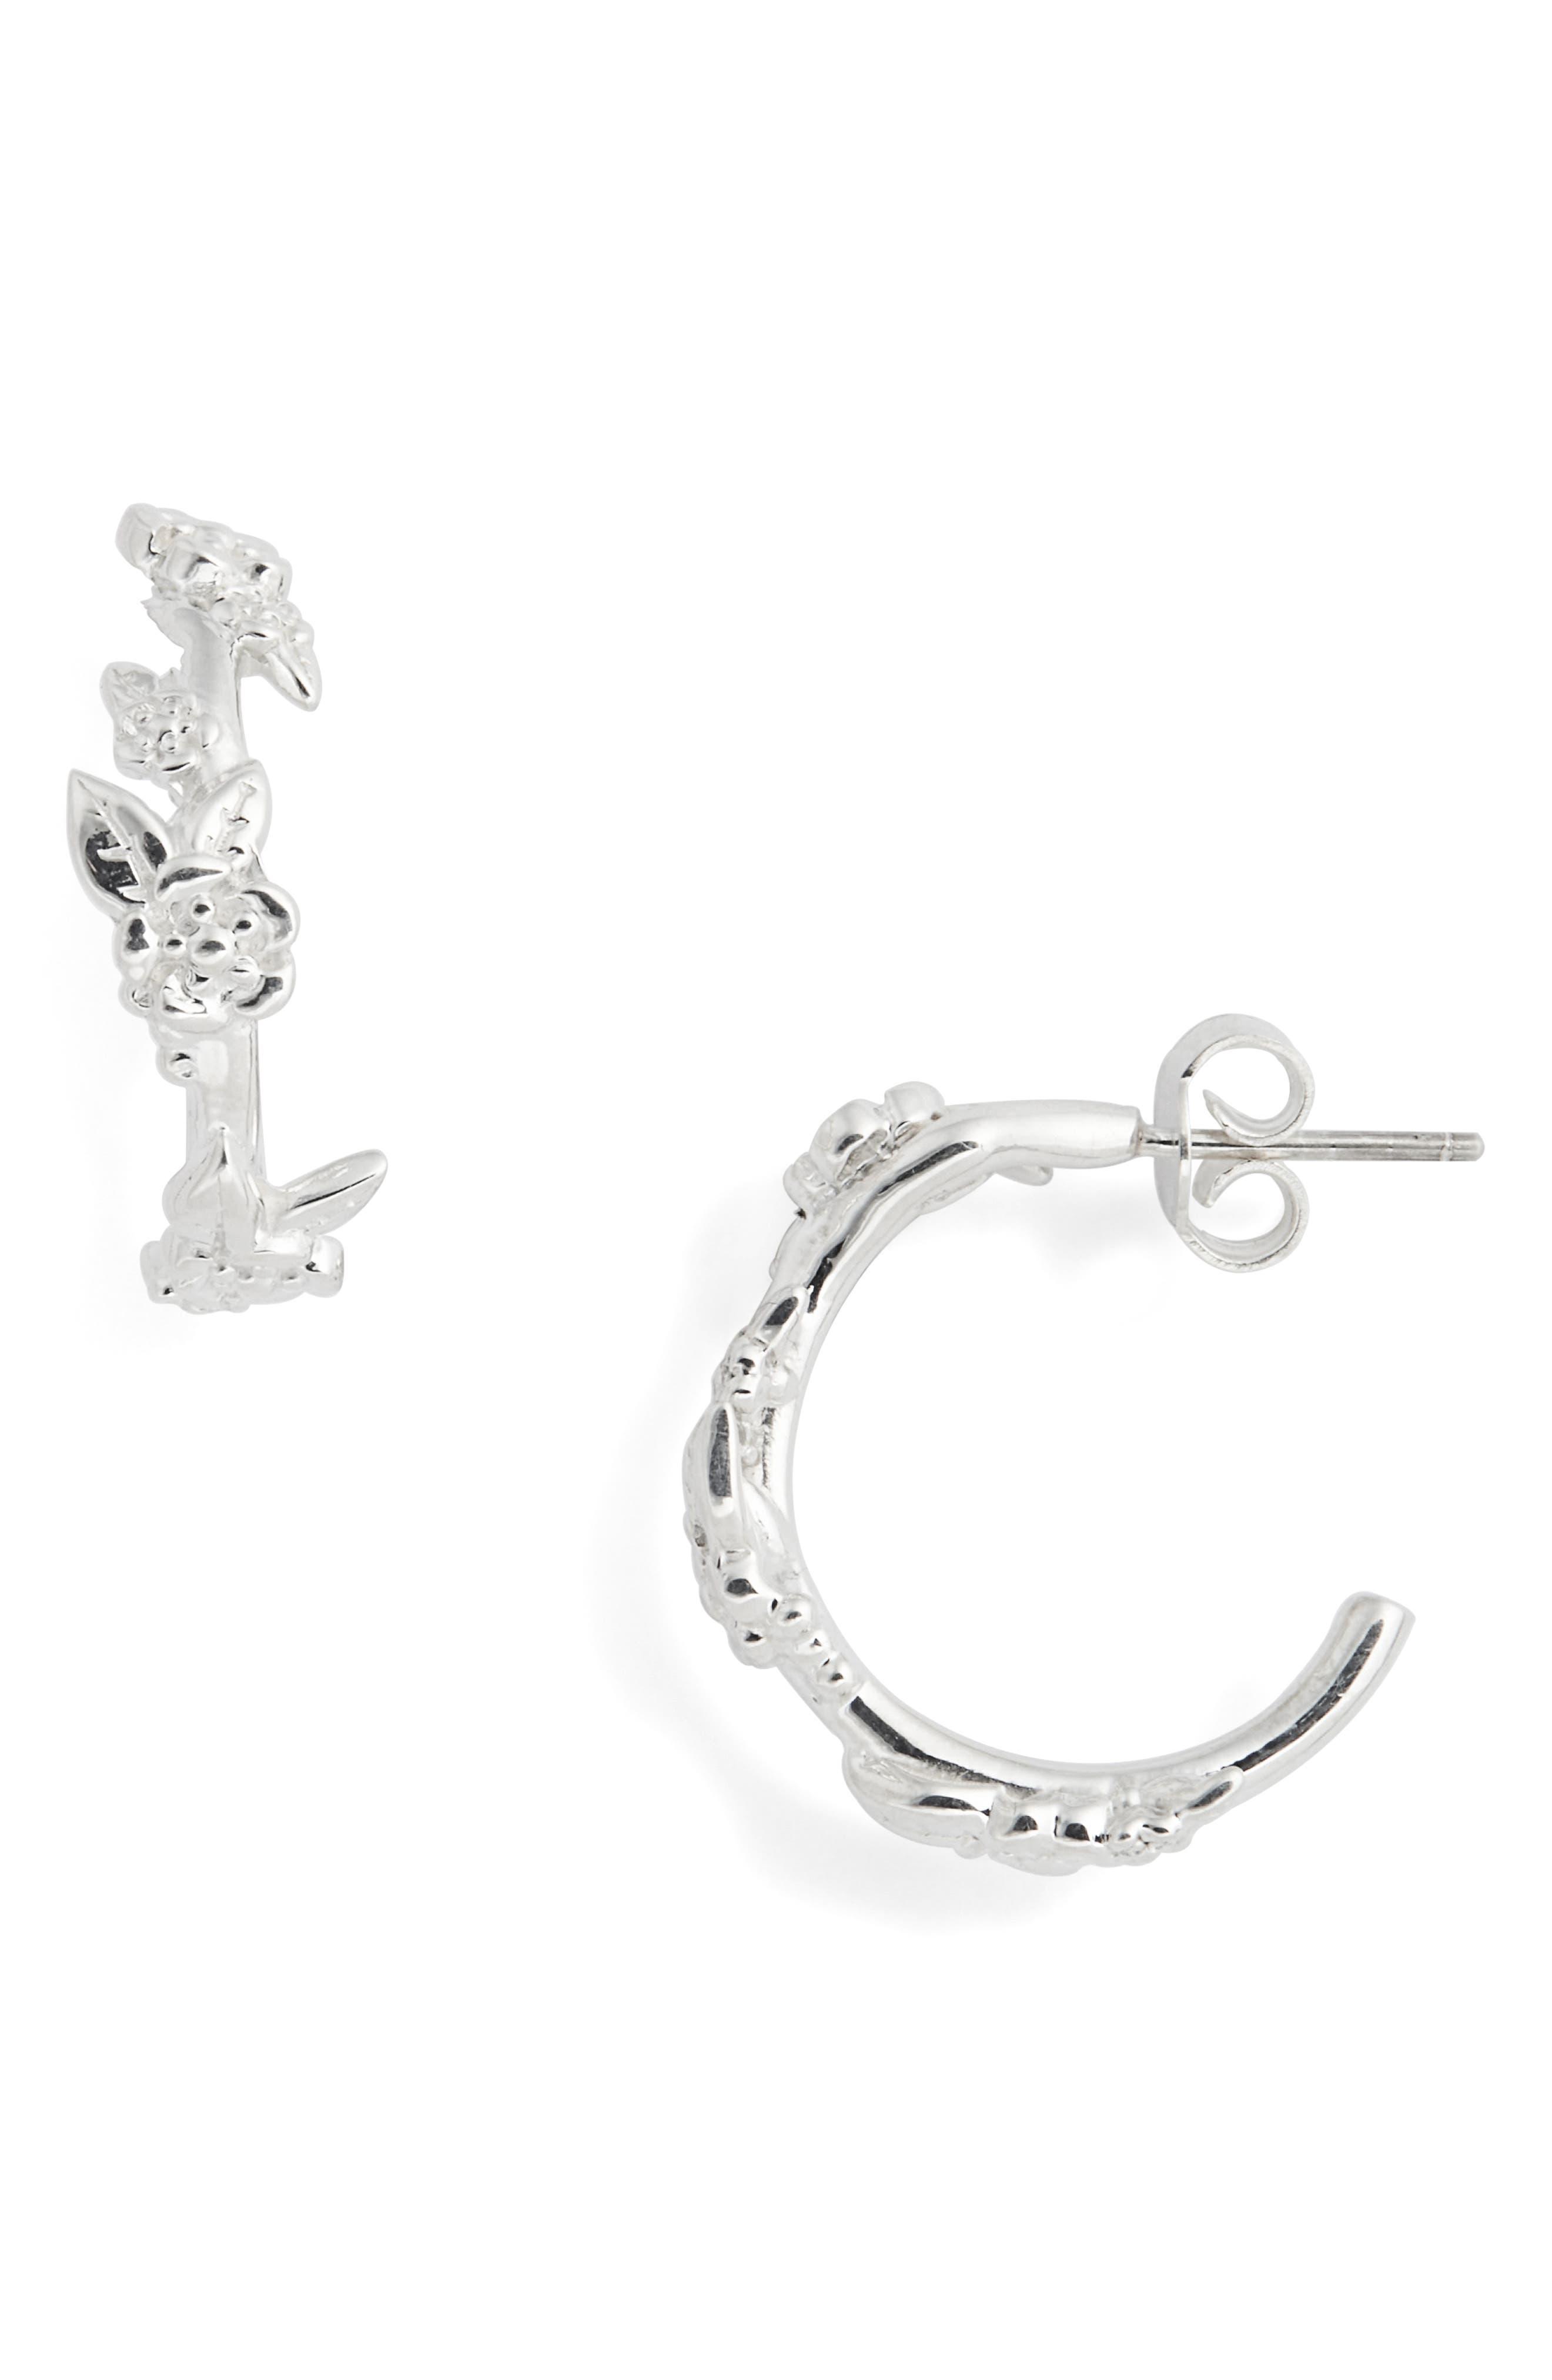 Small Alba Hoop Earrings,                             Main thumbnail 1, color,                             STERLING SILVER